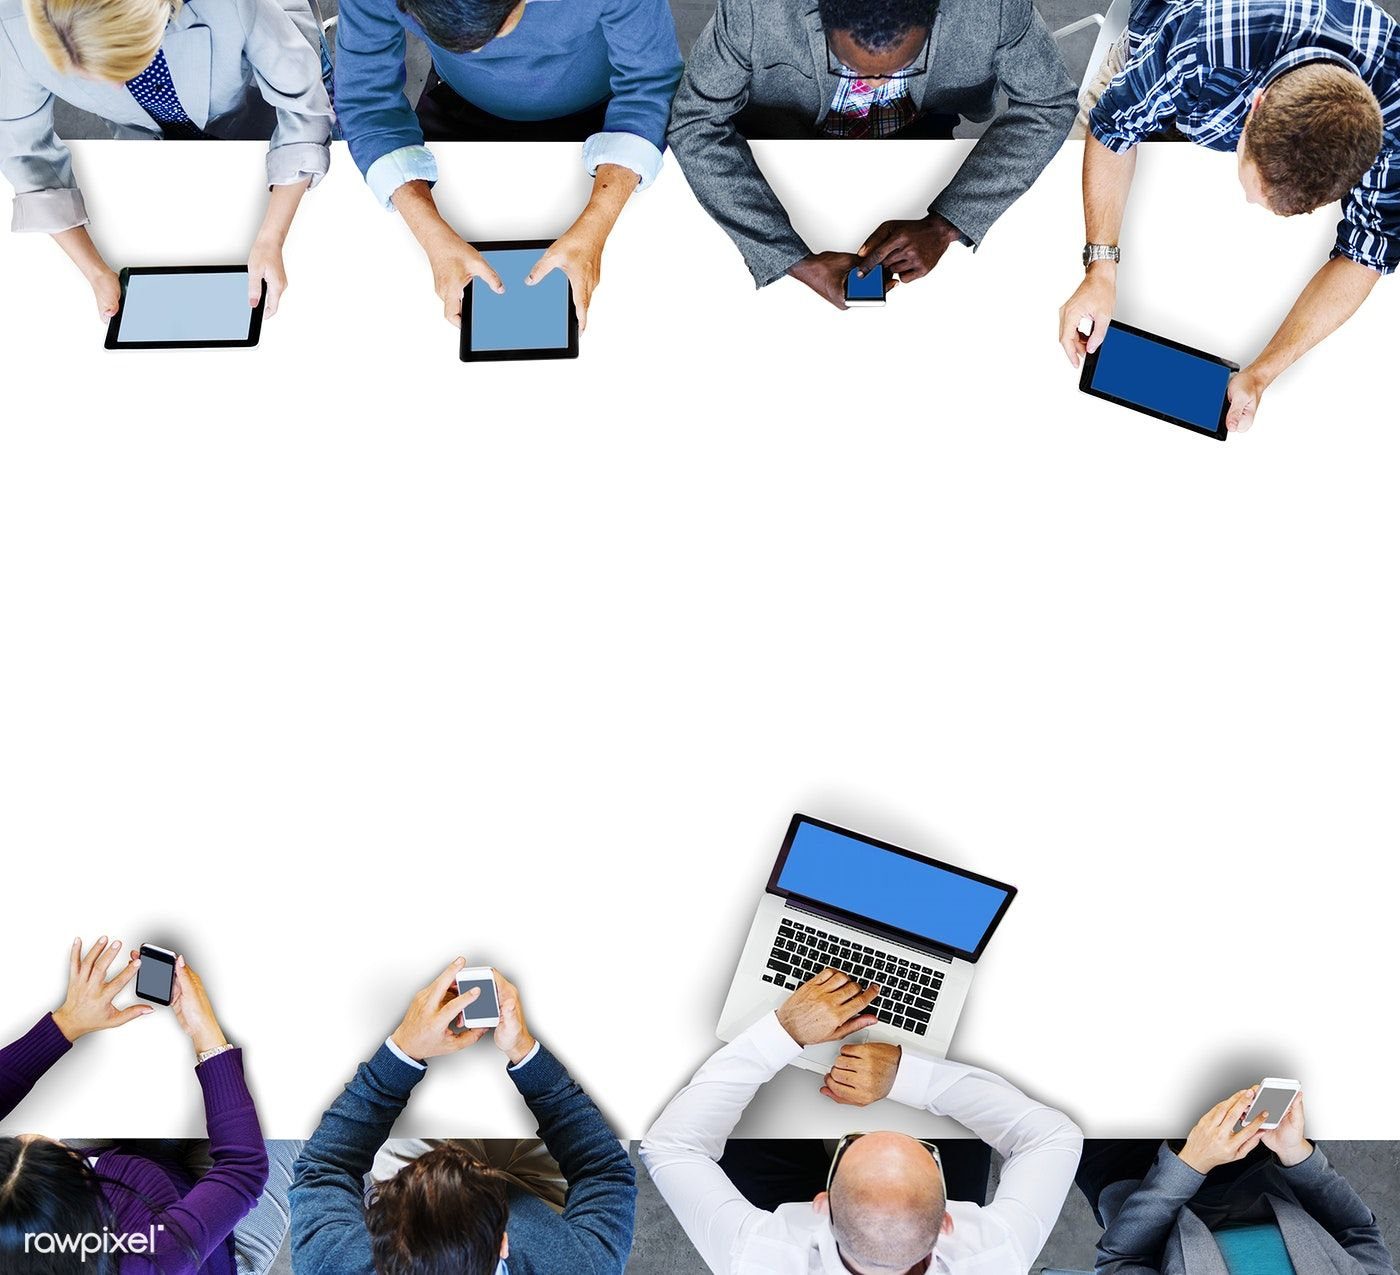 Download Premium Image Of Business People Using Digital